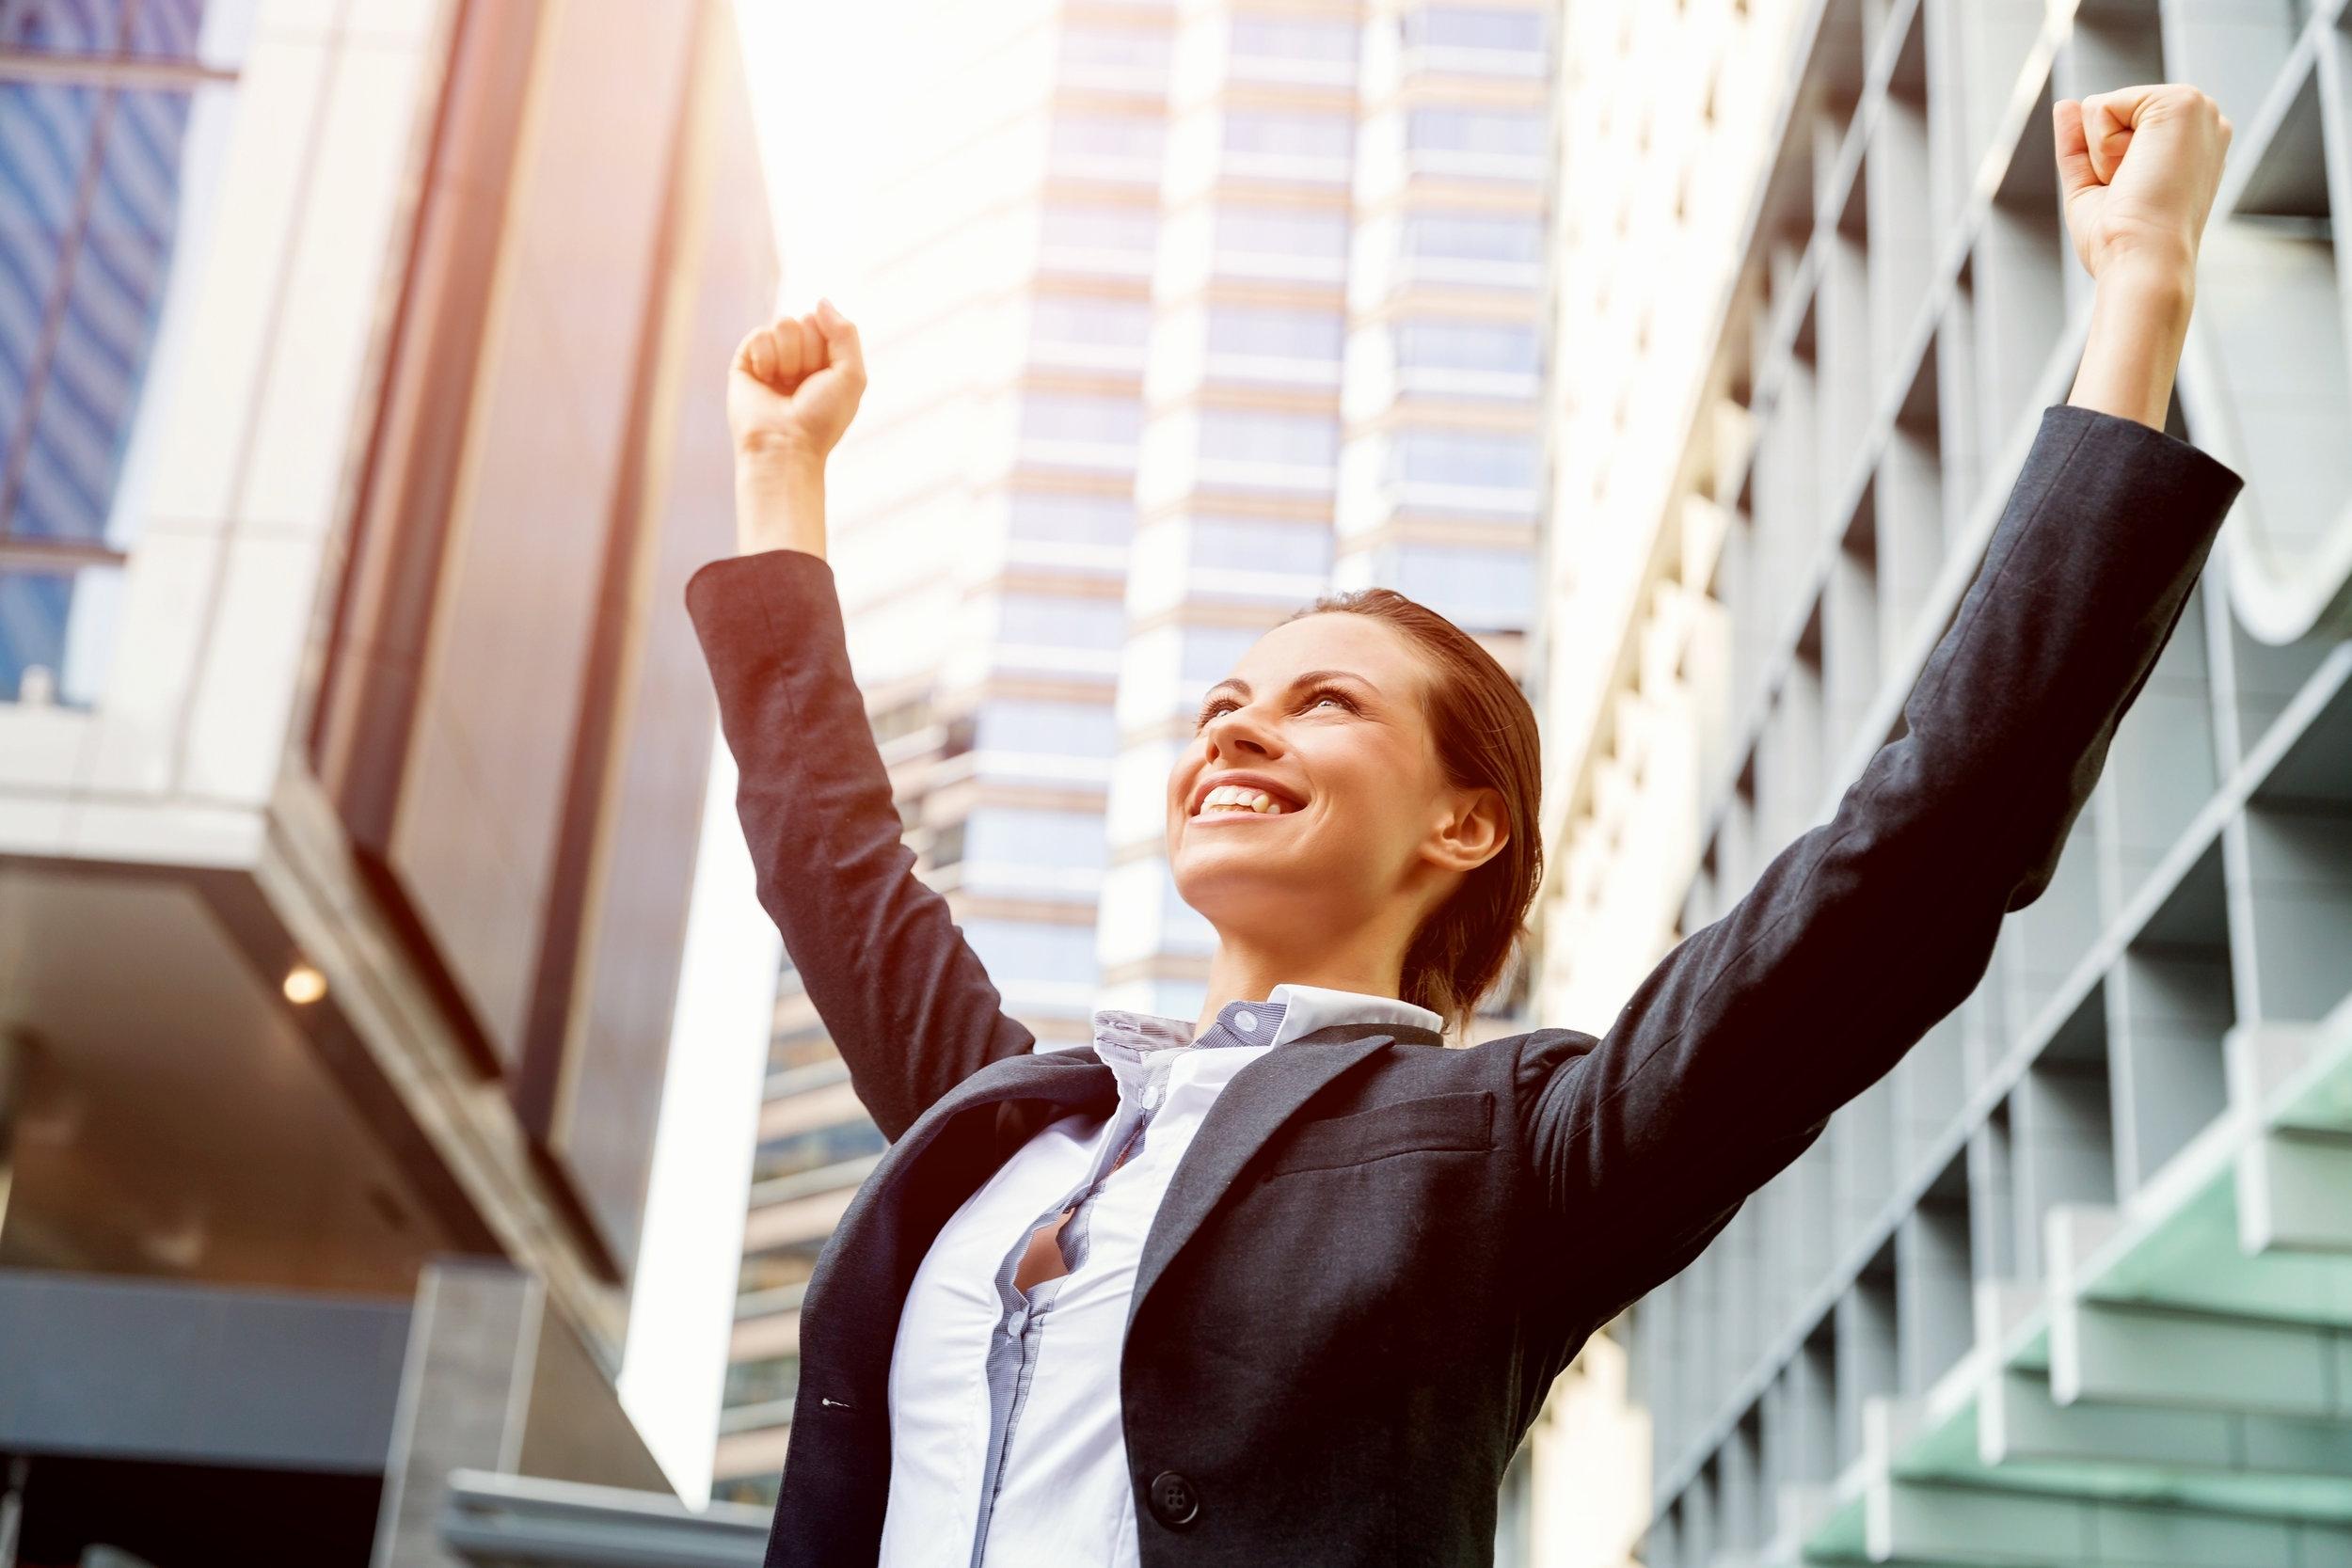 biz lady celebrates_shutterstock_384641254.jpg